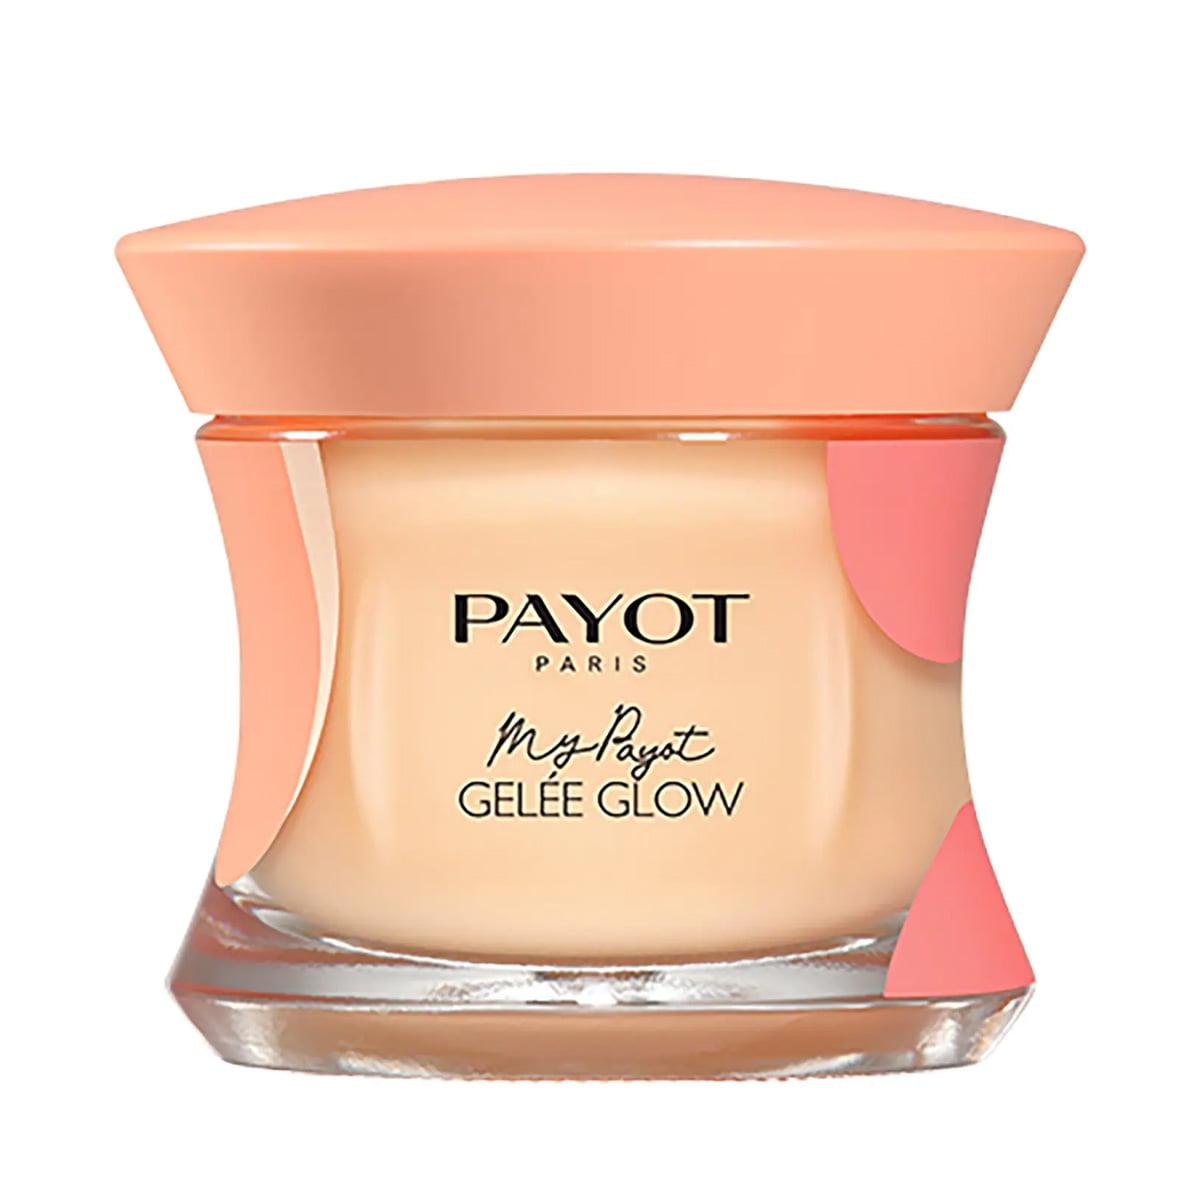 Payot - My Payot Gelée Glow - La gelée vitaminée révélatrice d'éclat